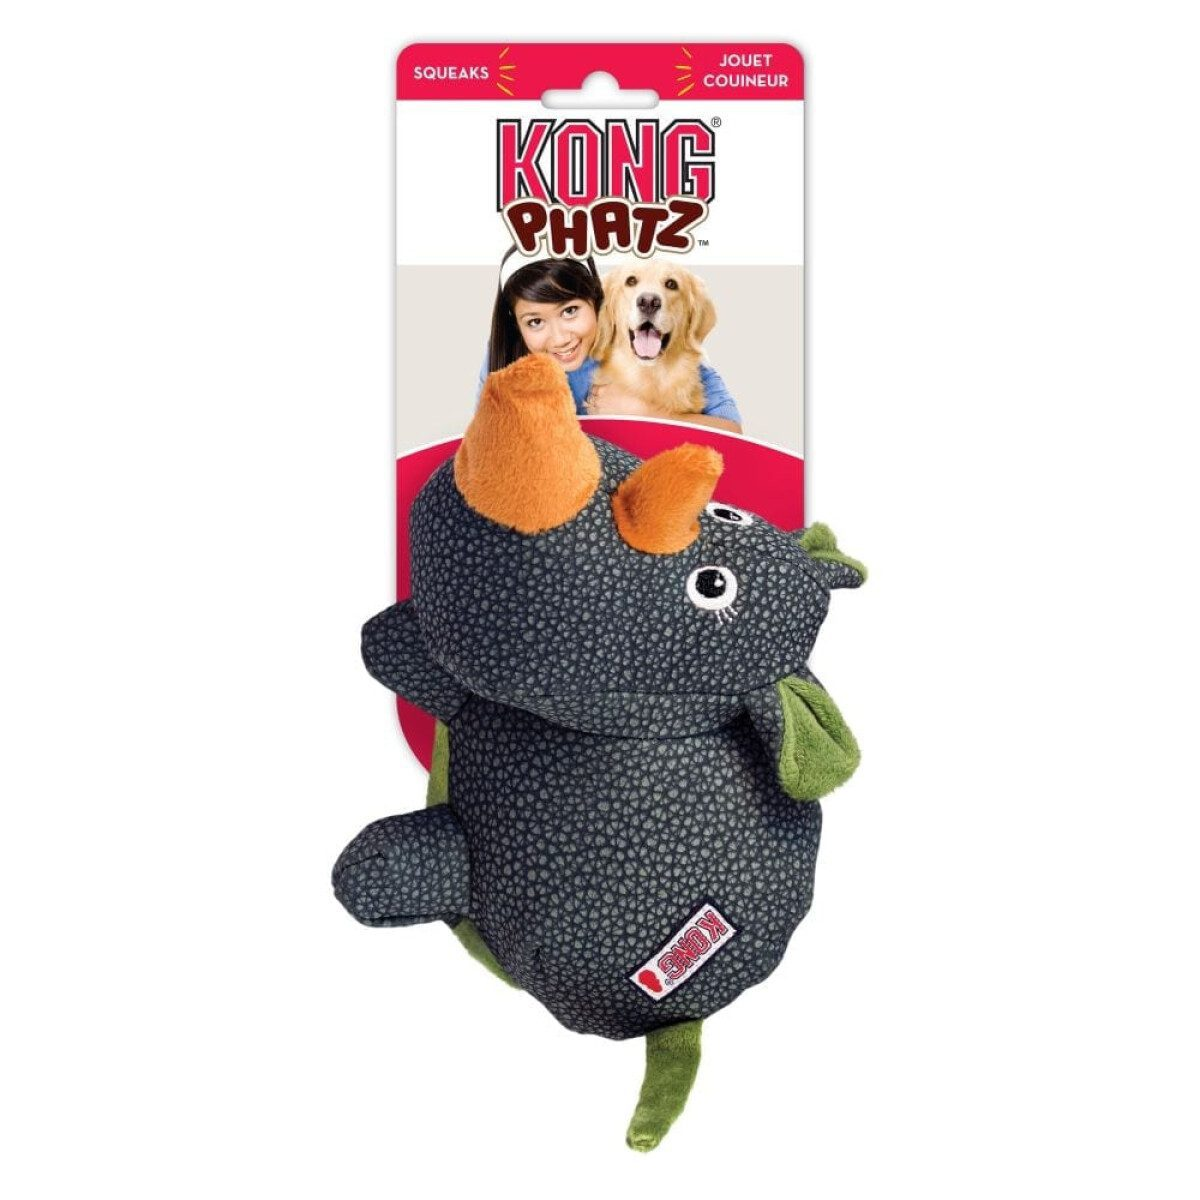 Kong PHATZ - Nosorog